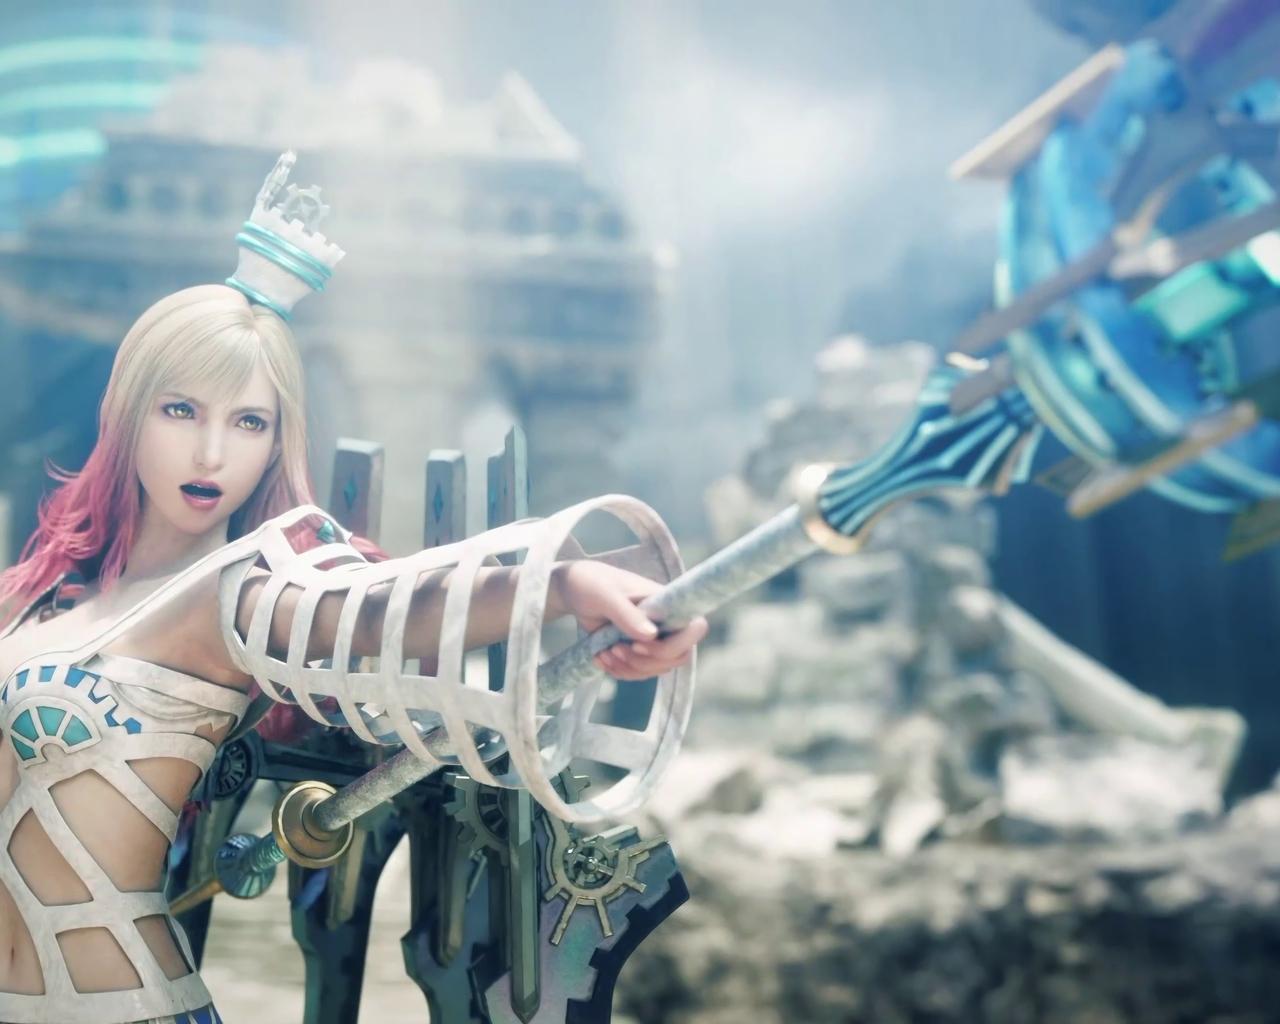 dissidia-final-fantasy-nt-4k-game-rq.jpg